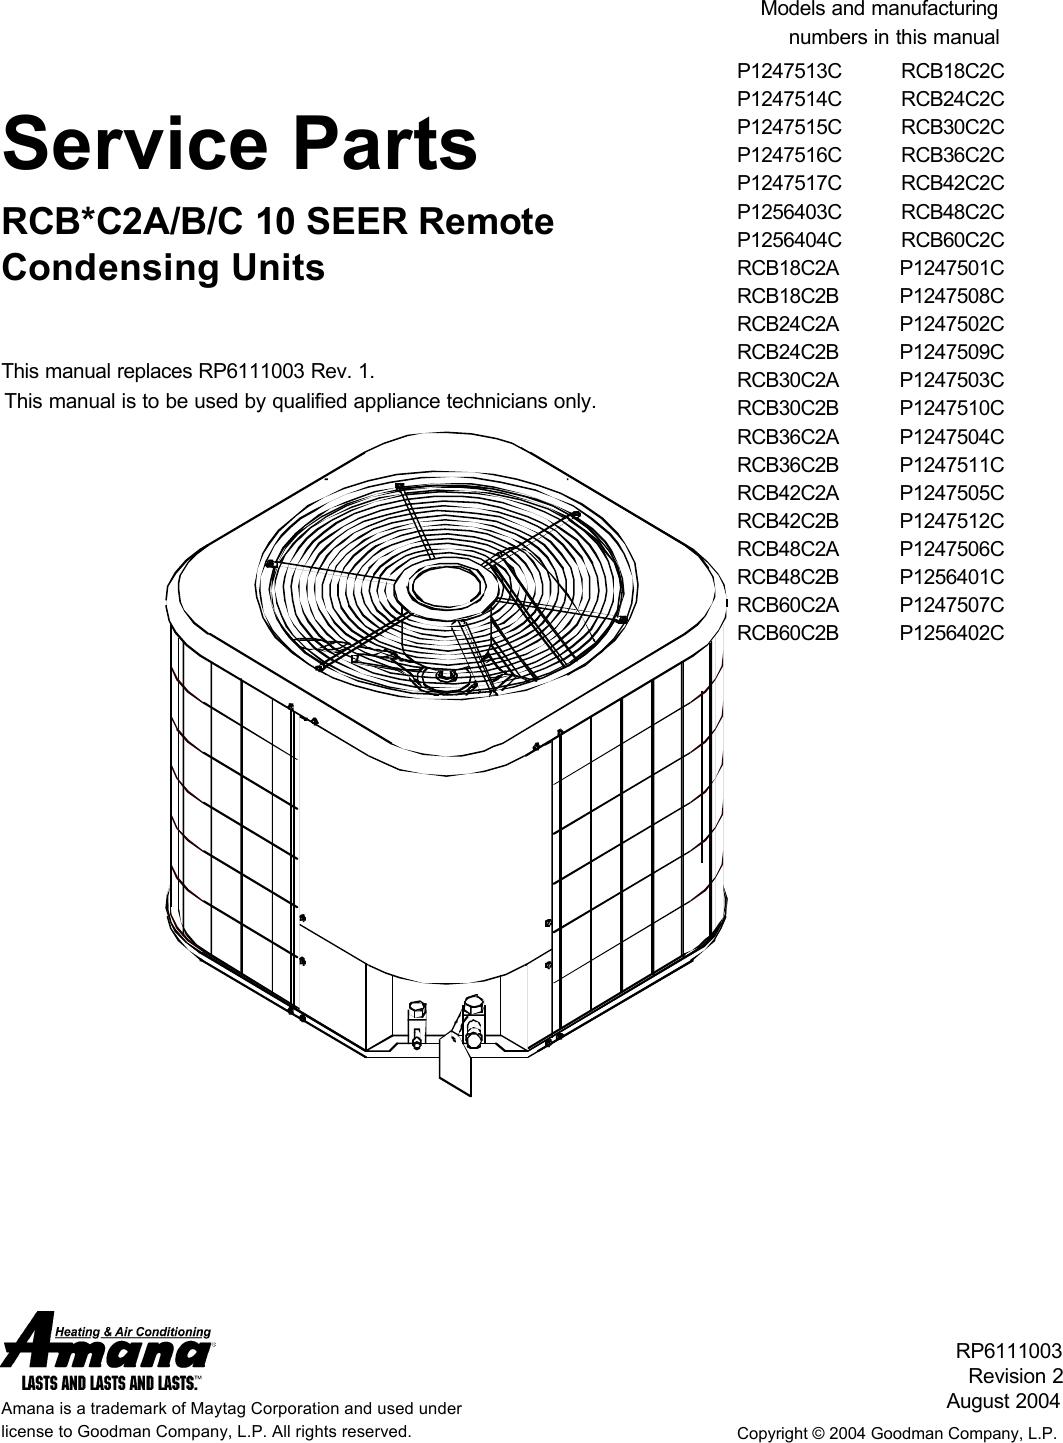 amana air conditioner rcb18c2cp1247513c users manual rpt parts cover